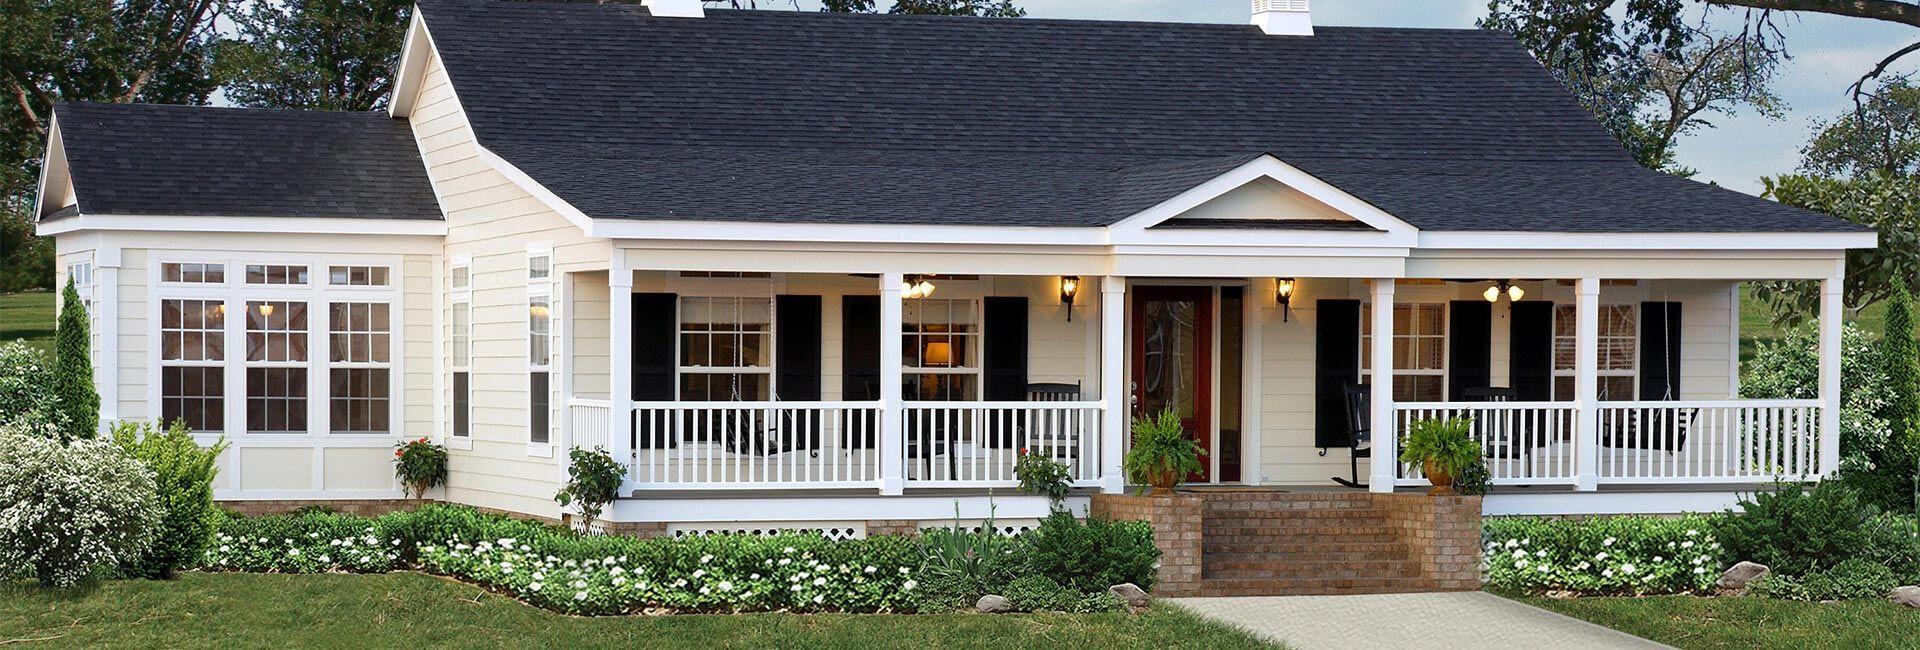 Modular Home Builder Manufactured Home Dealer Pratt